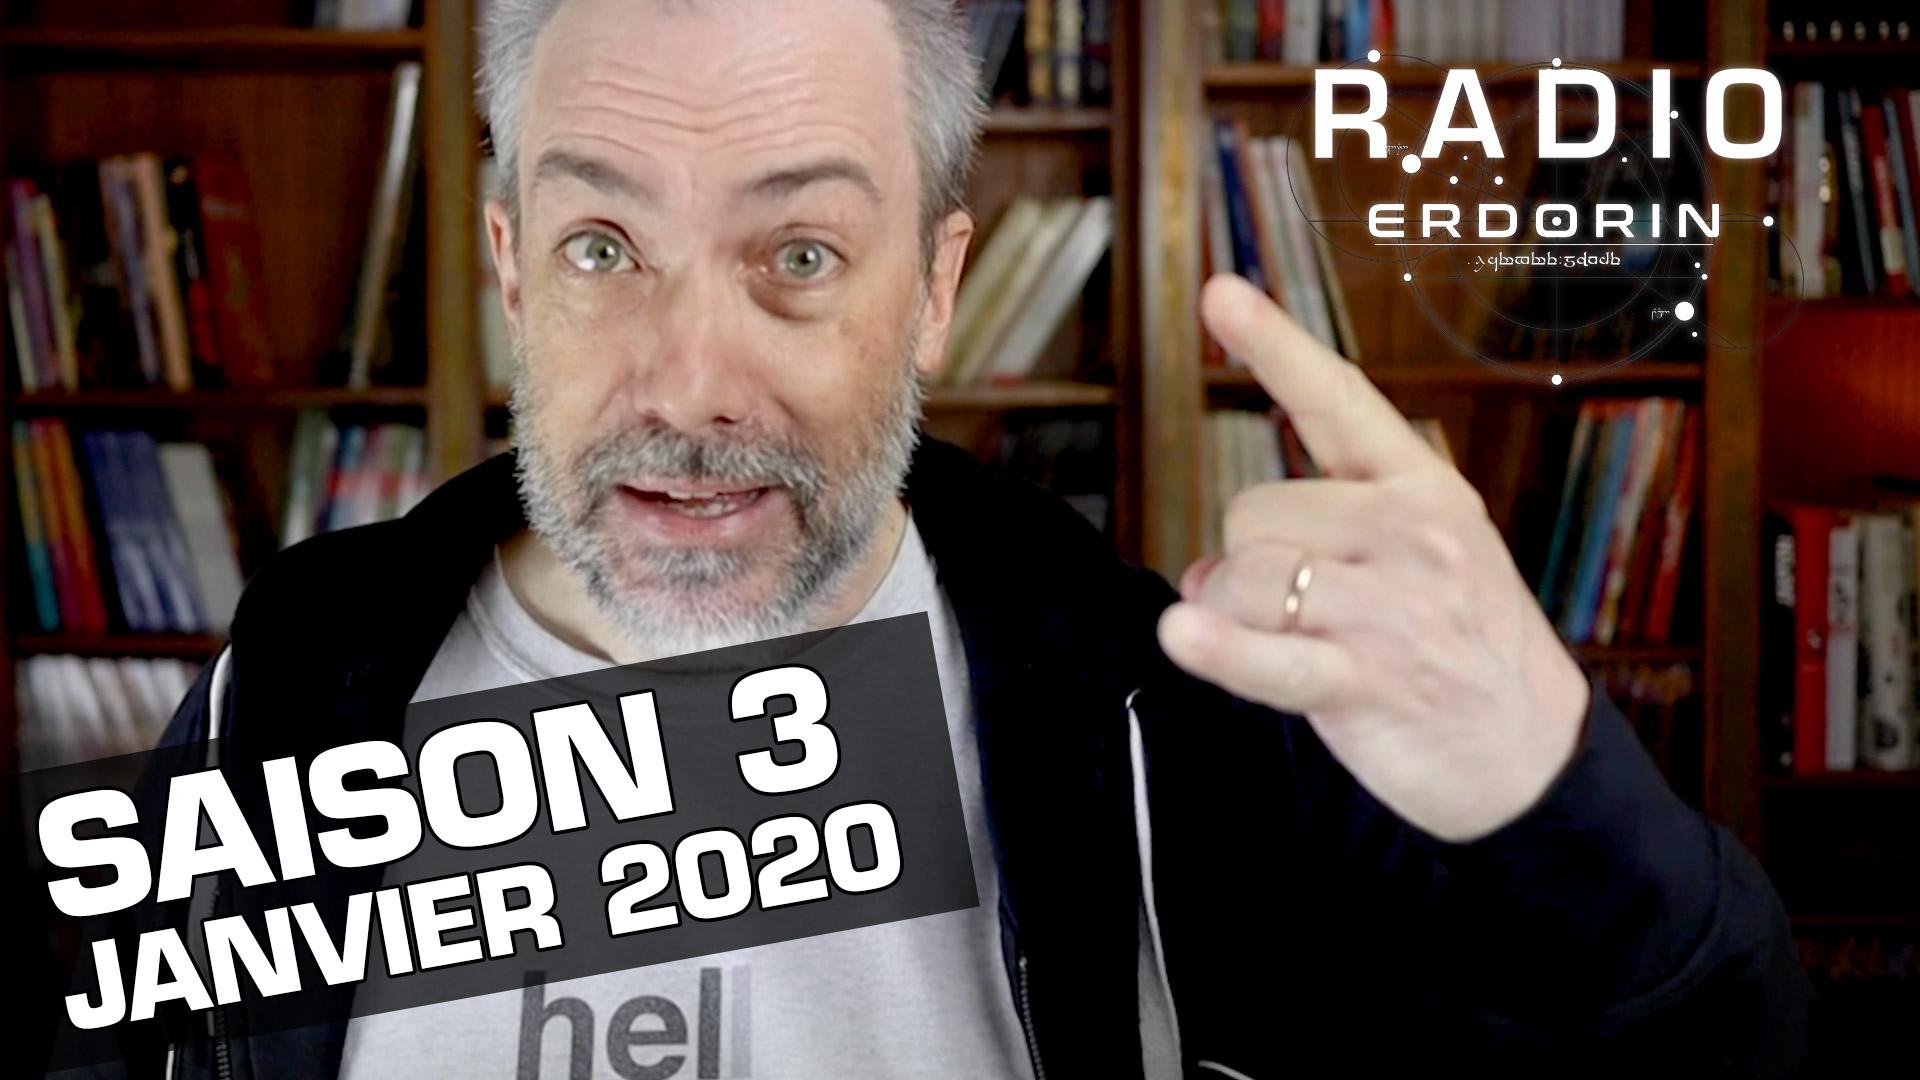 Radio-Erdorin S3E1 - Janvier 2020